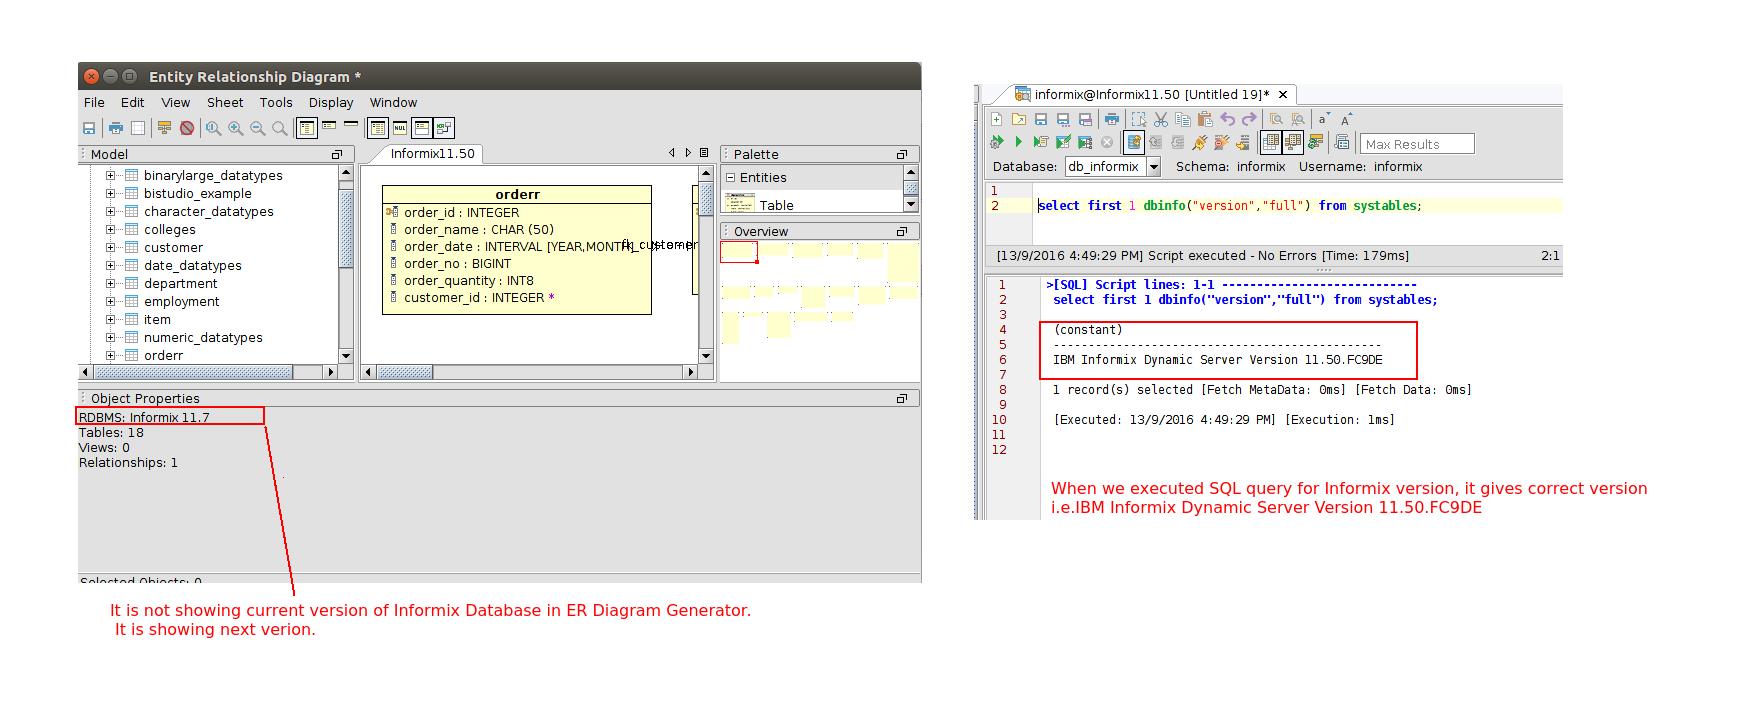 14697 informix in er diagram generator current version ie ads18 231g ccuart Images